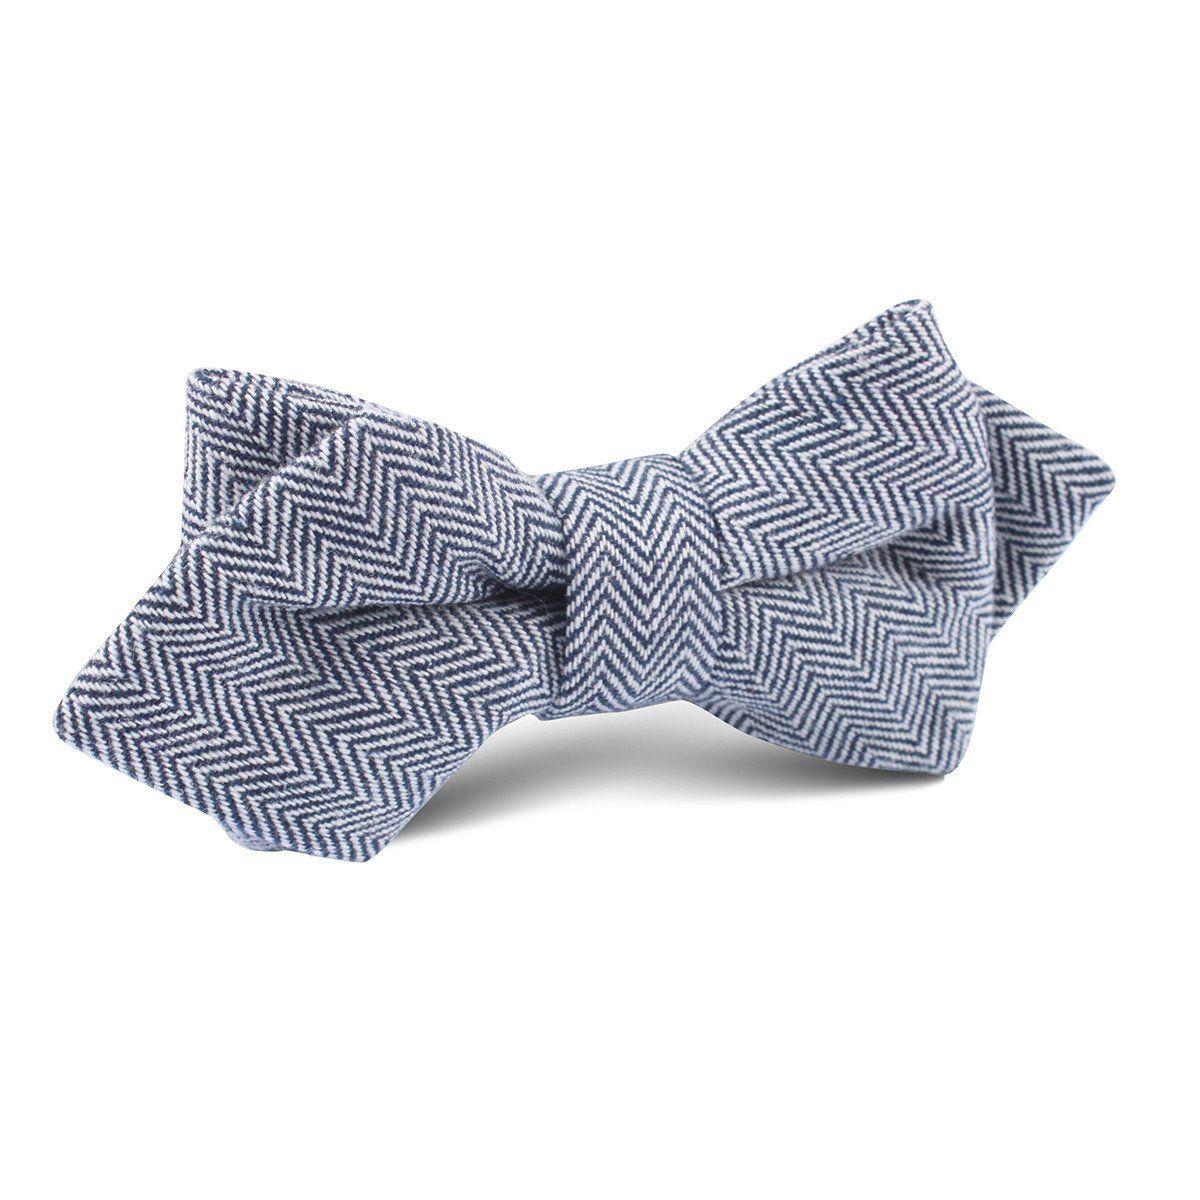 ff33a51bb2e8 Navy Blue Herringbone Linen Diamond Bow Tie | Men's Tuxedo Suit Diamond Bow  Ties for Men